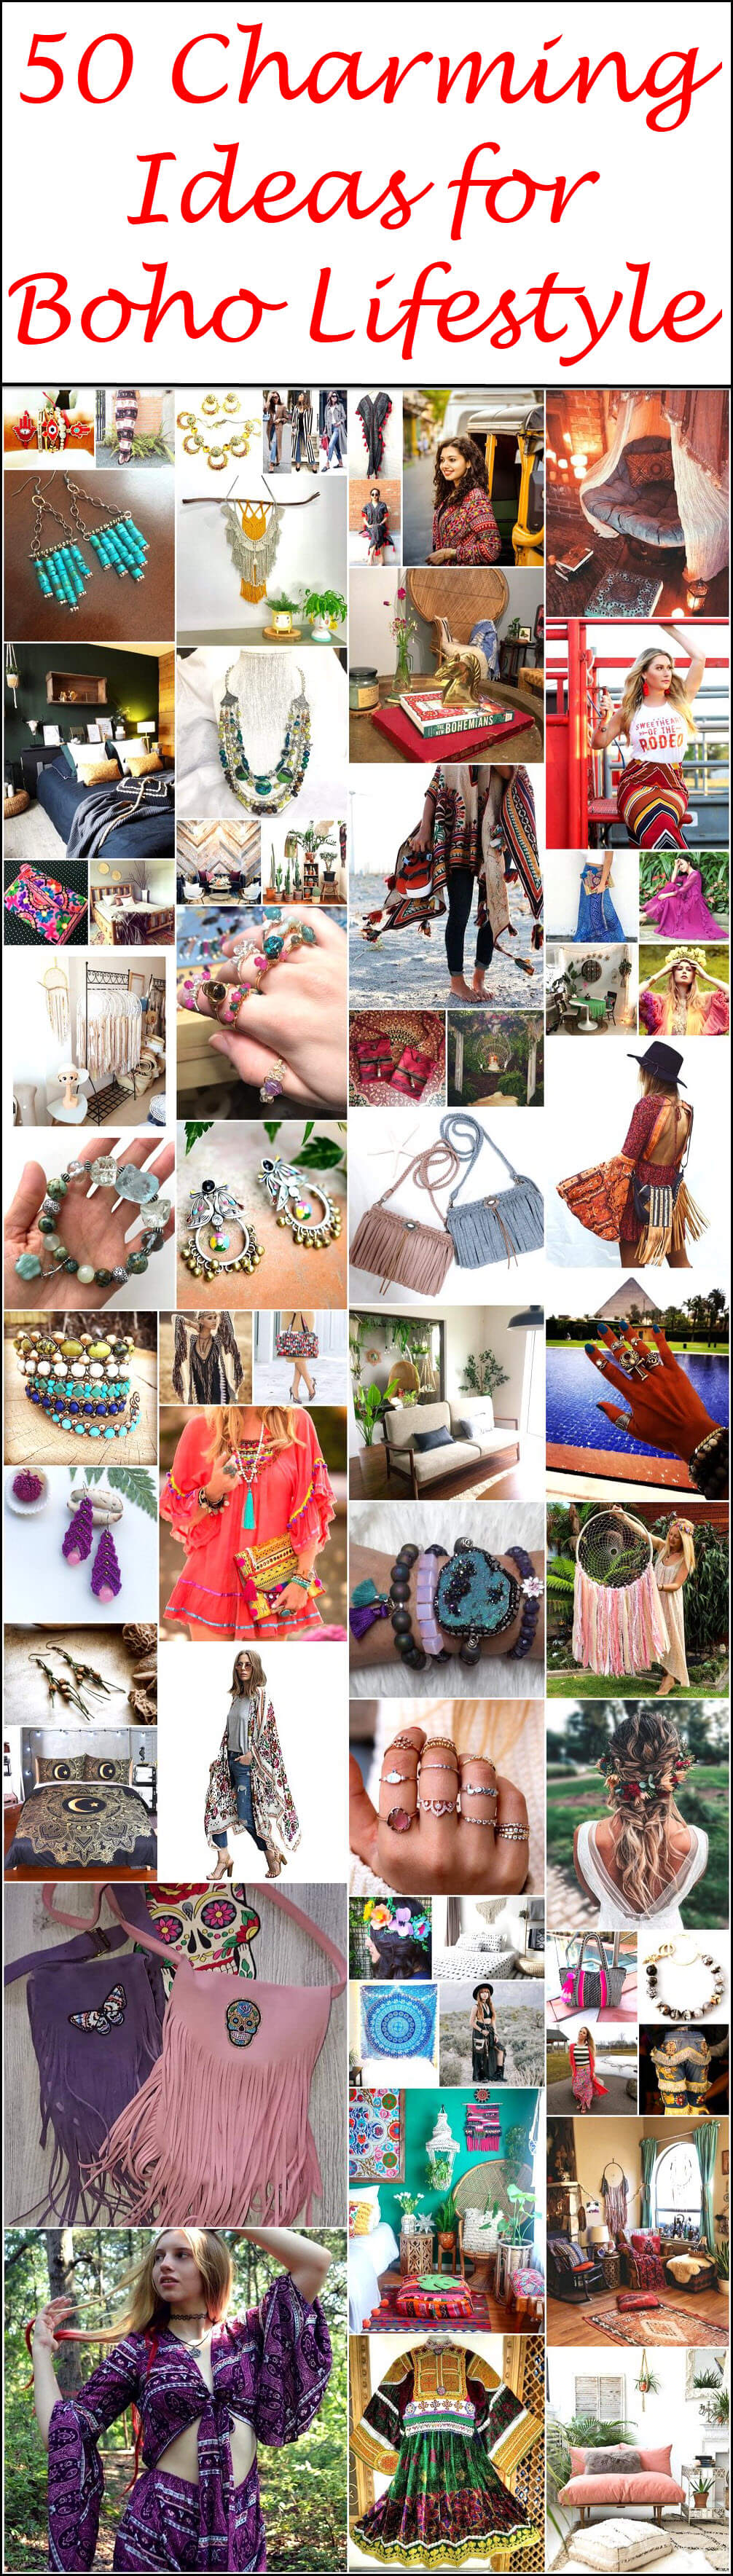 50 Charming Ideas for Boho Lifestyle